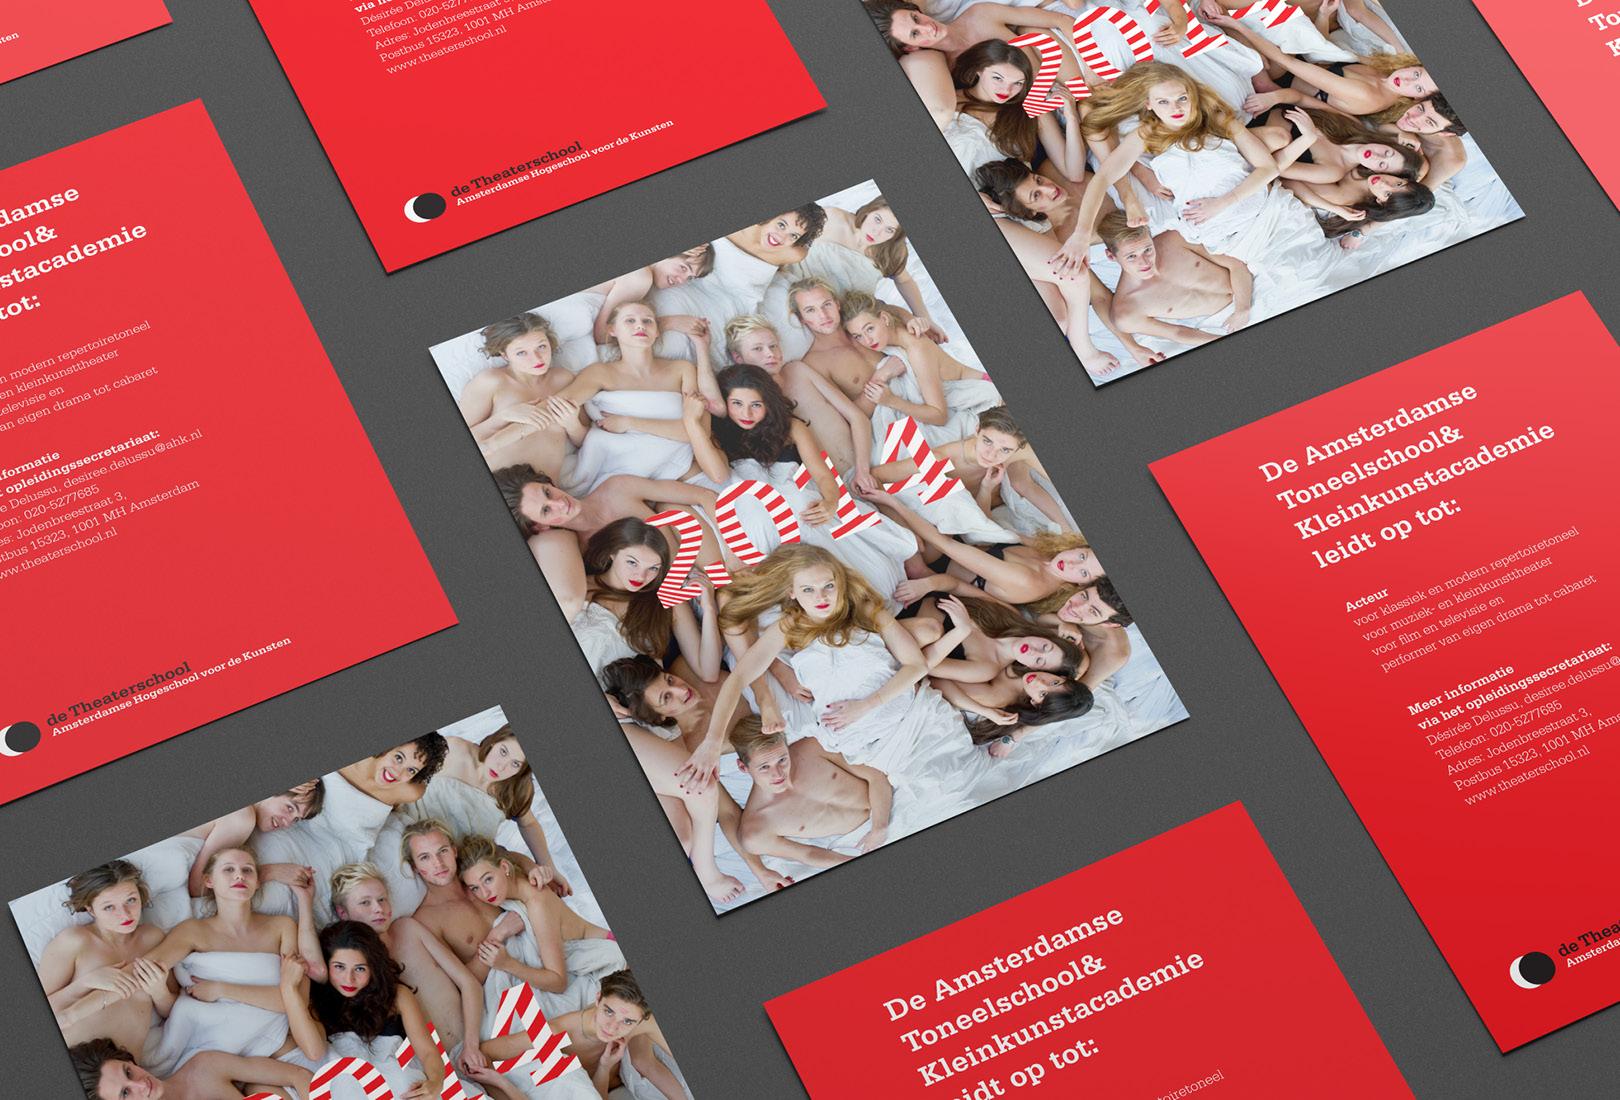 Josselin-tourette-thonik-AHK-Card-image-